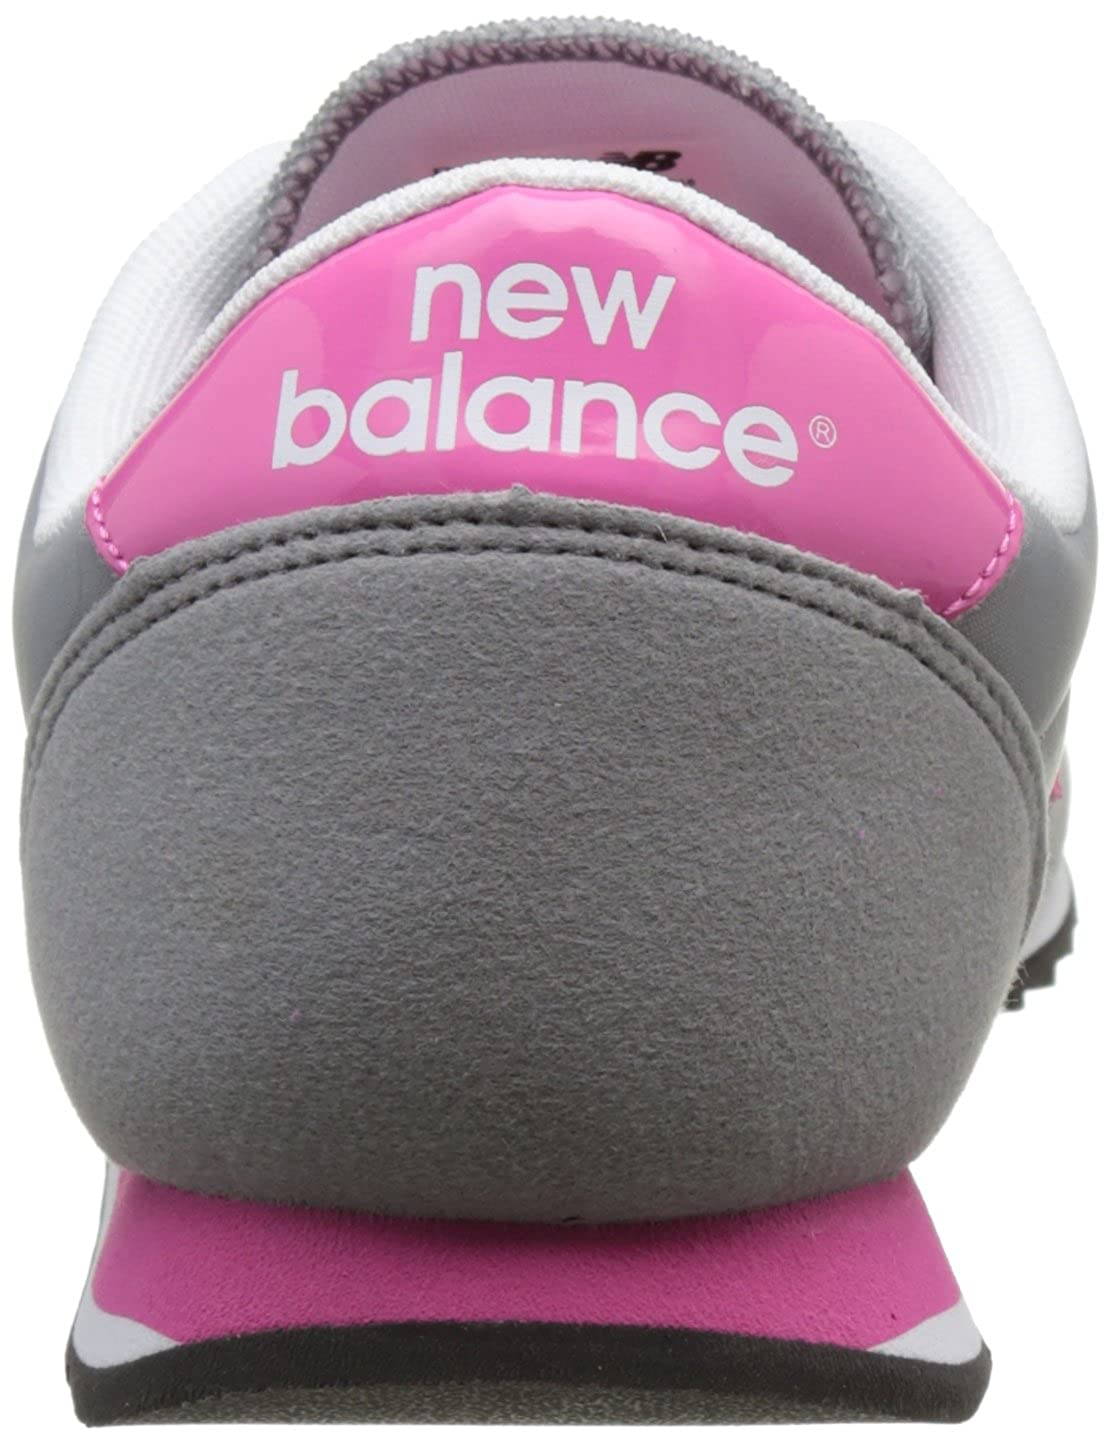 New New New Balance 396, Scarpe Running Unisex – Adulto cc5294